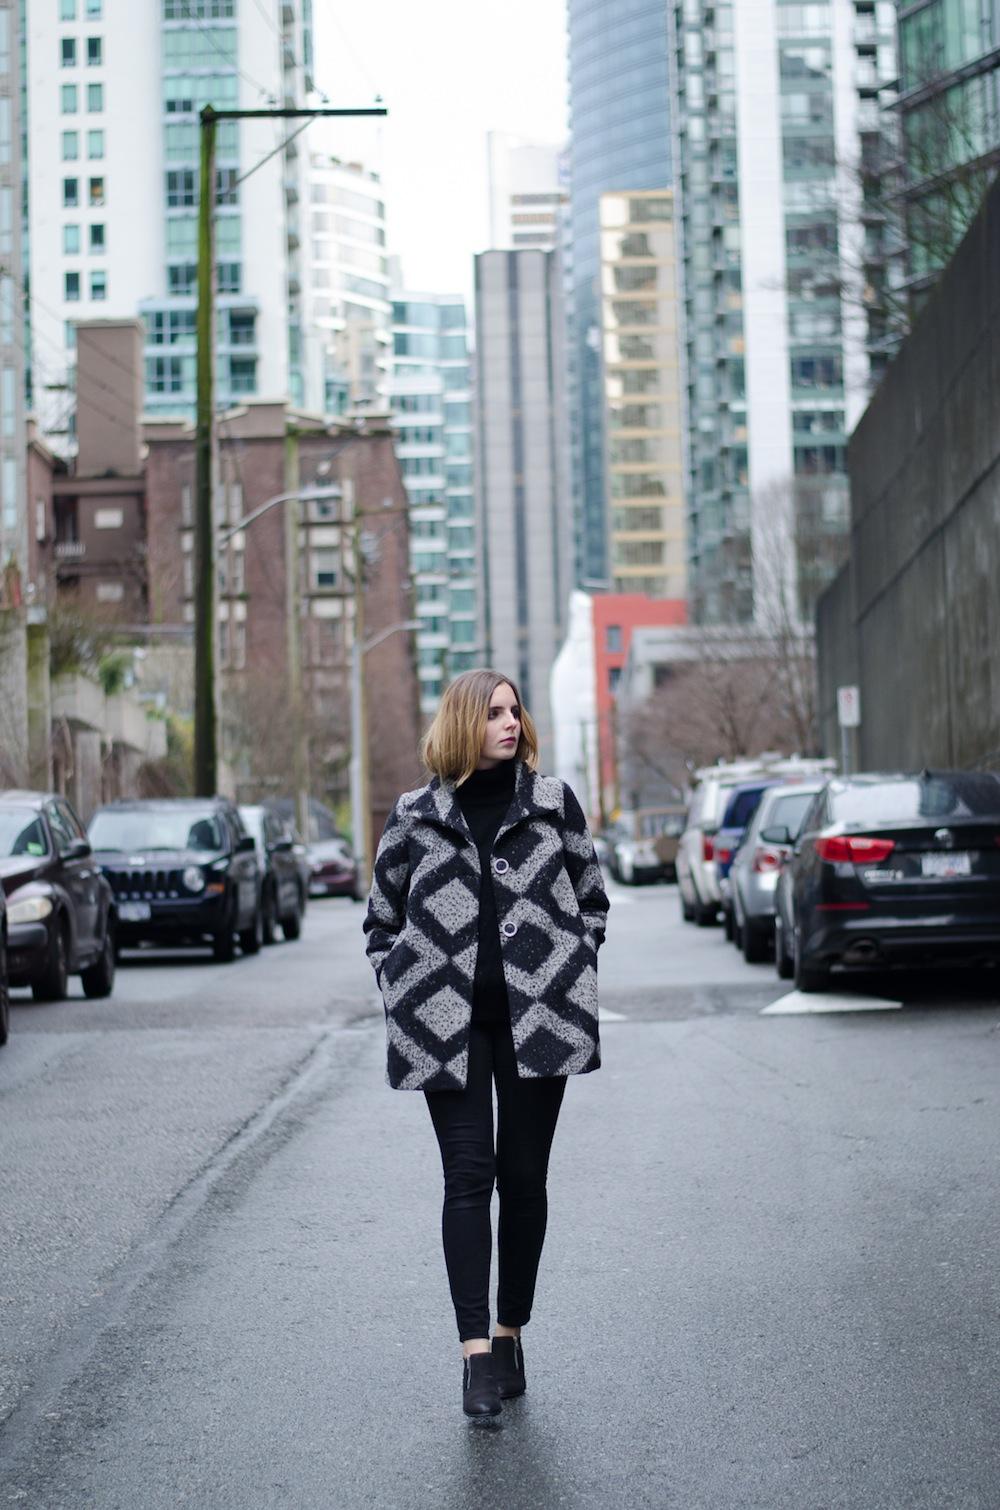 the minimalist style look, the urban umbrella style blog, vancouver style blog, vancouver style blogger, vancouver style bloggers, vancouver fashion blog, vancouver lifestyle blog, vancouver health blog, vancouver fitness blog, vancouver travel blog, canadian fashion blog, canadian style blog, canadian lifestyle blog, canadian health blog, canadian fitness blog, canadian travel blog, west coast style, bree aylwin, minimalist fashion blog, how to wear minimalist style trend, minimalist fashion trend outfit ideas, top vancouver fashion bloggers, top fashion blogs, best style blogs 2015, popular fashion blogs, top style blogs, top lifestyle blogs, top fitness blogs, top health blogs, top travel blogs